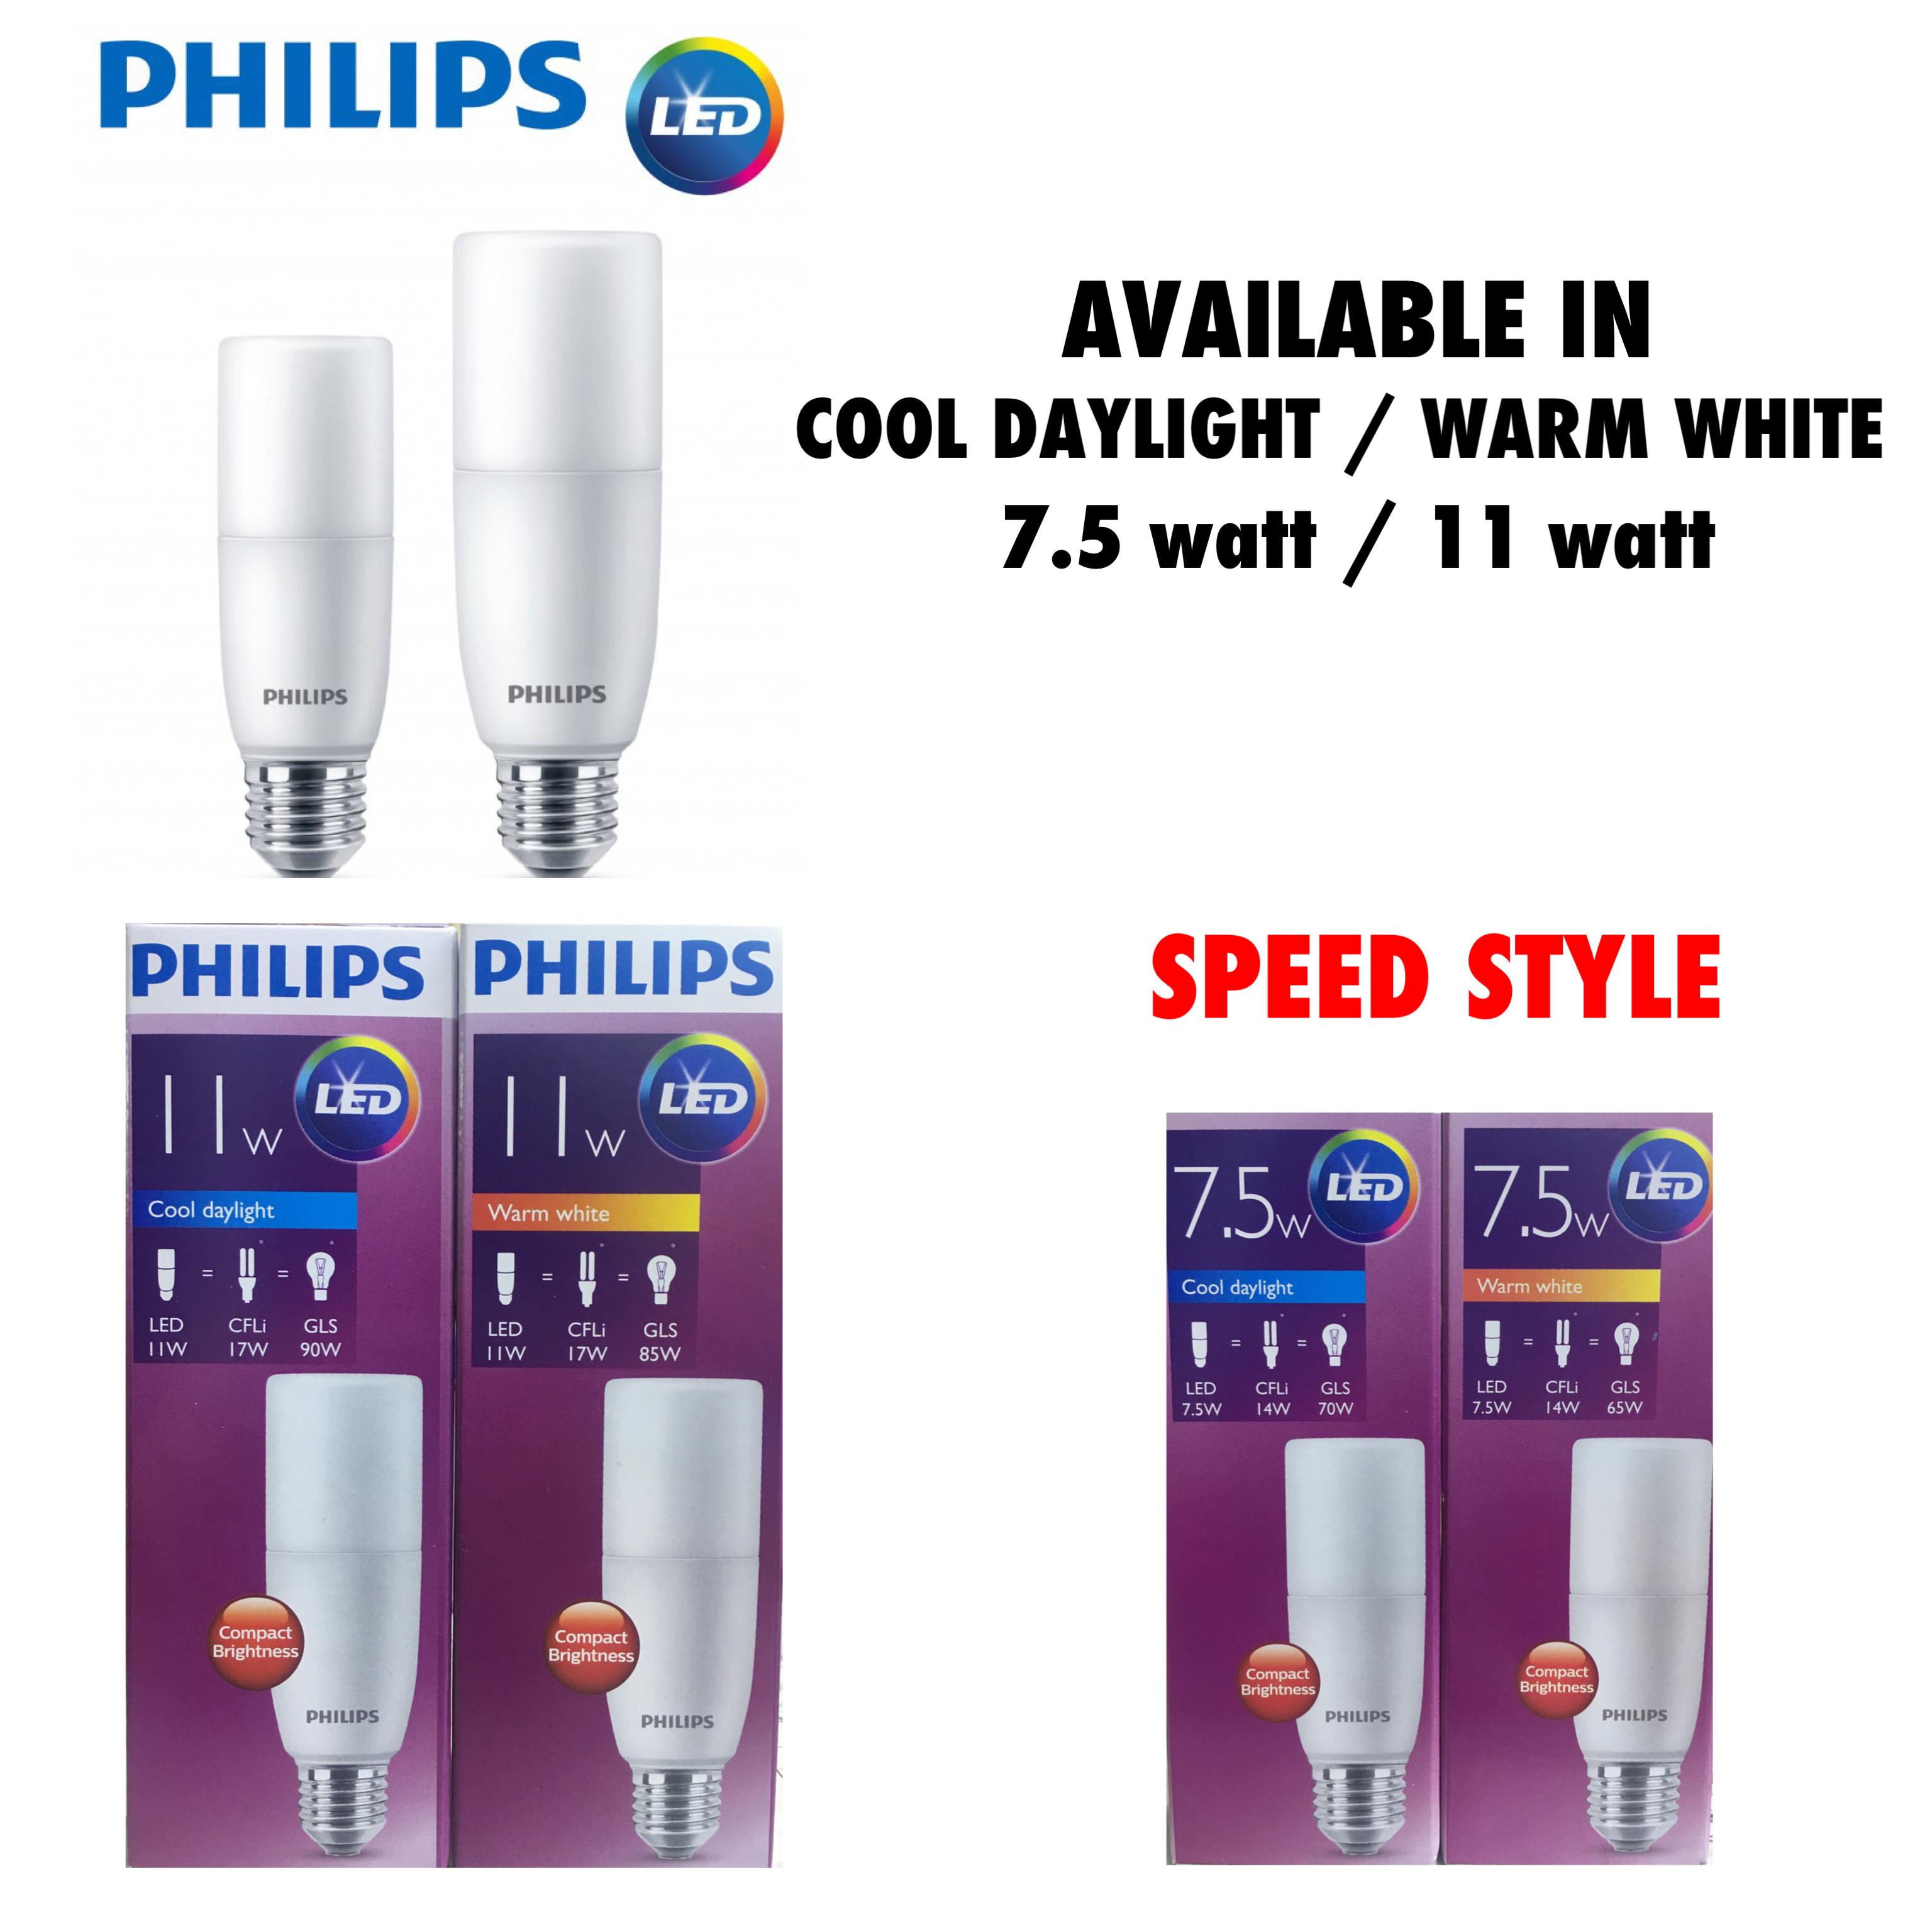 Qoo10 Philips Led Stick Furniture Deco Bulb 3w Gen V Show All Item Images